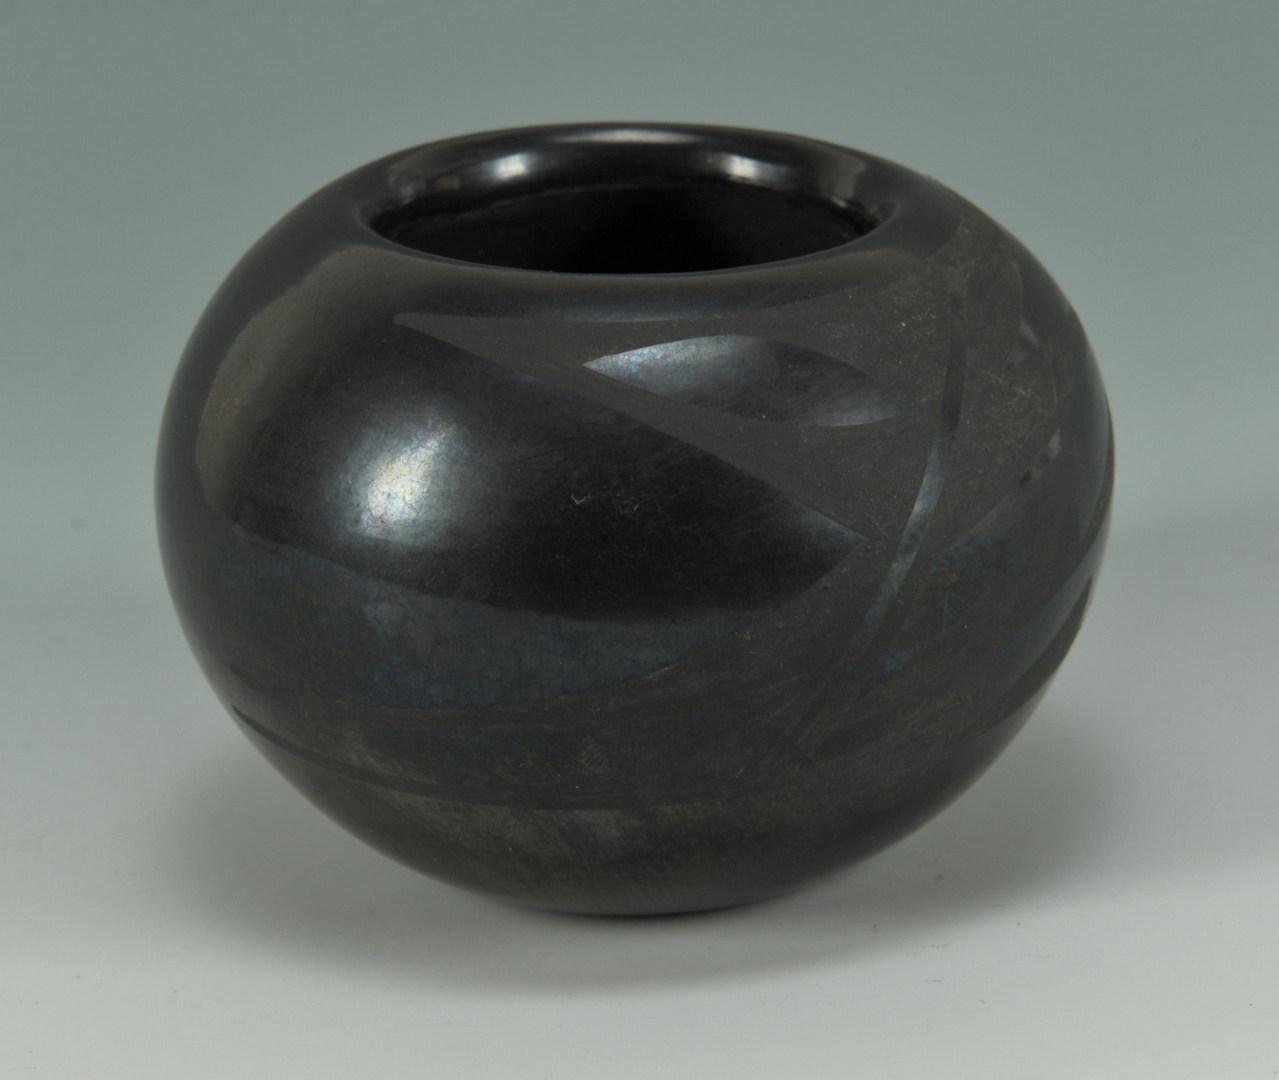 Lot 395: San Ildefonso blackware bowl, Blue Corn